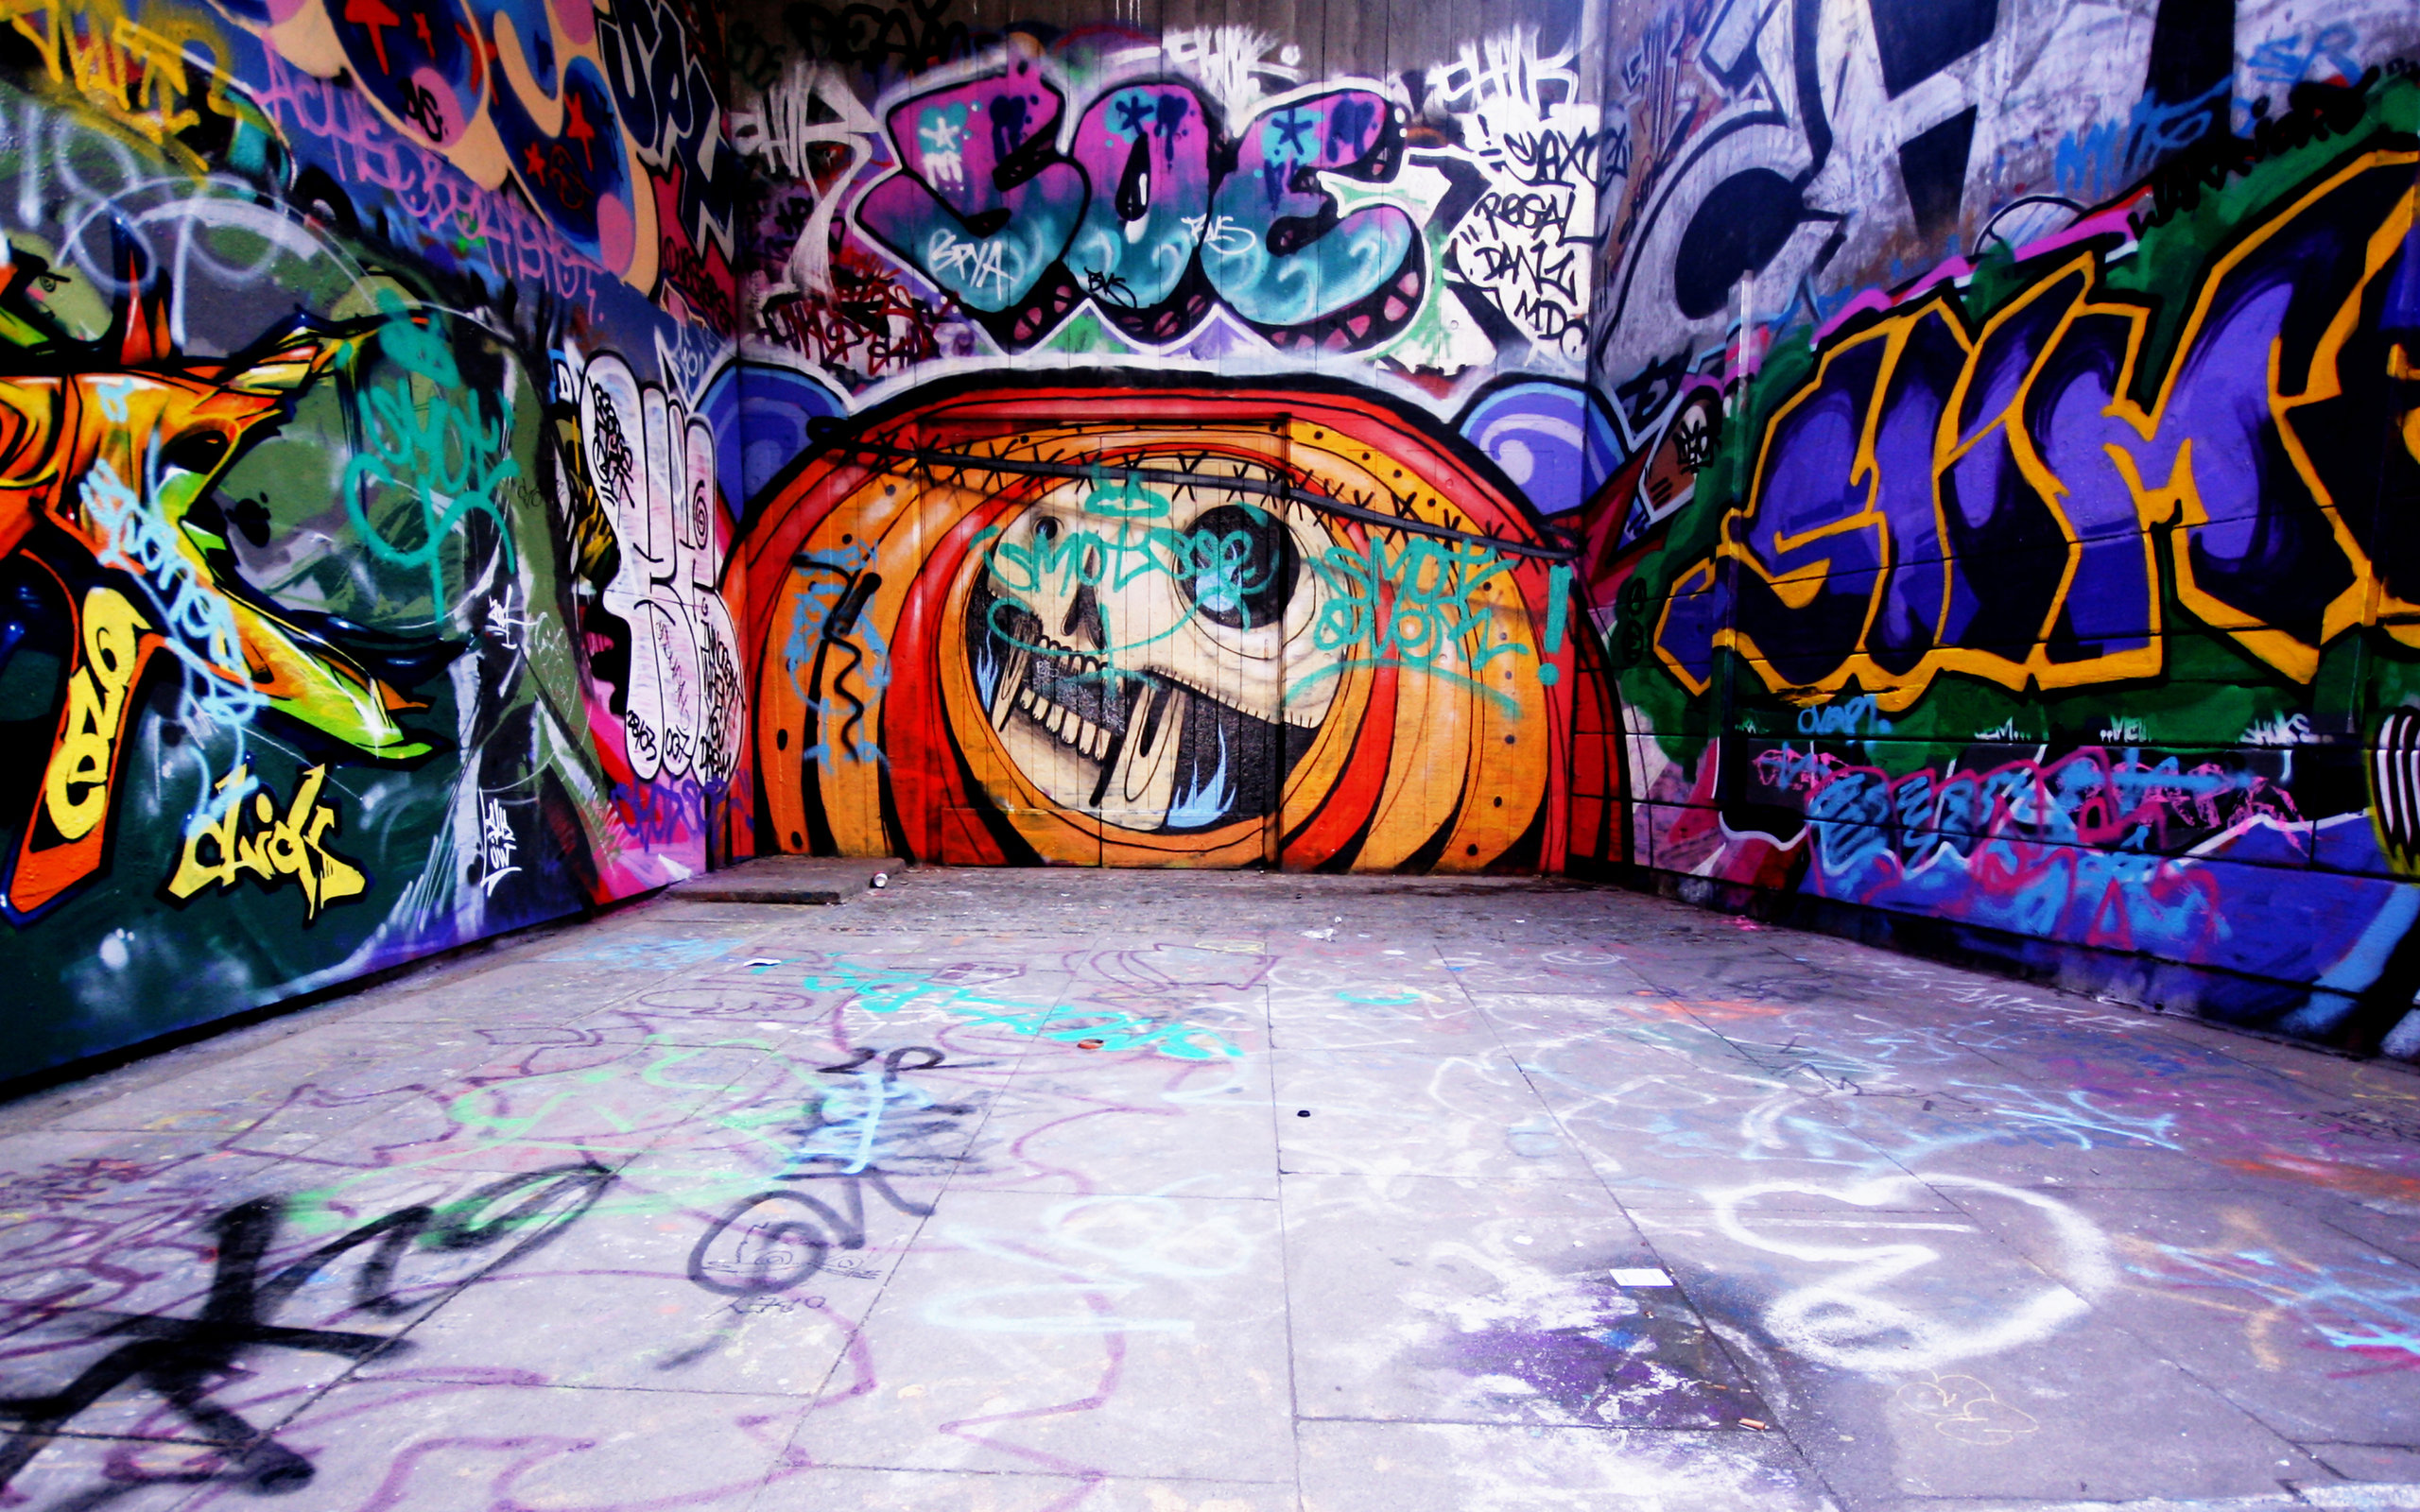 Shiva 3d Name Wallpapers Download Graffiti Backgrounds Wallpaper 2560x1600 71121